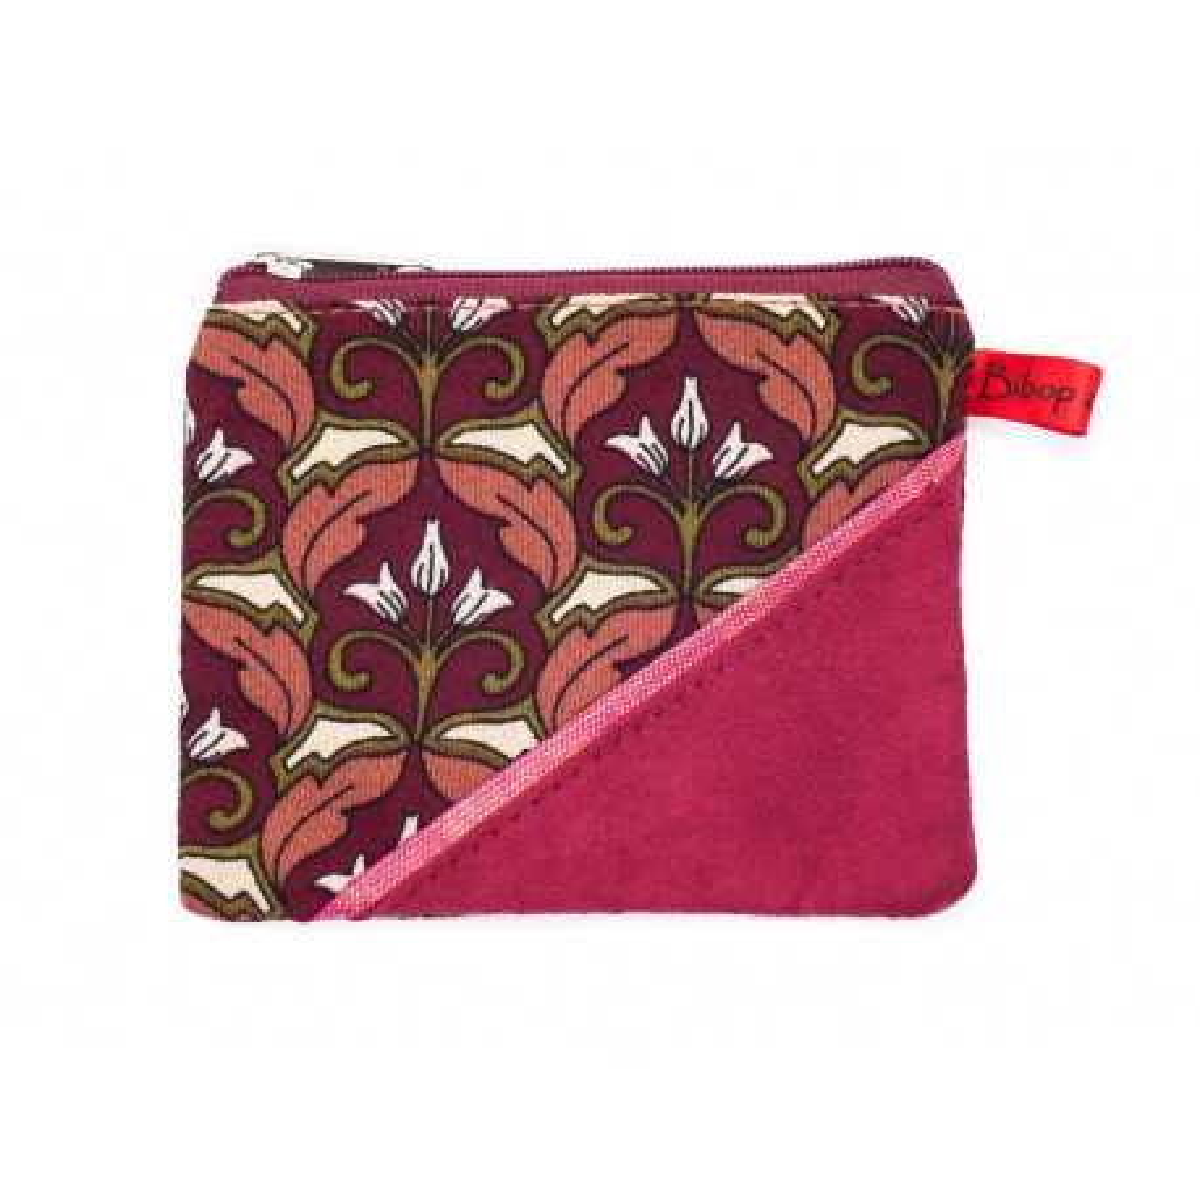 Petit porte-monnaie zippé rose framboise